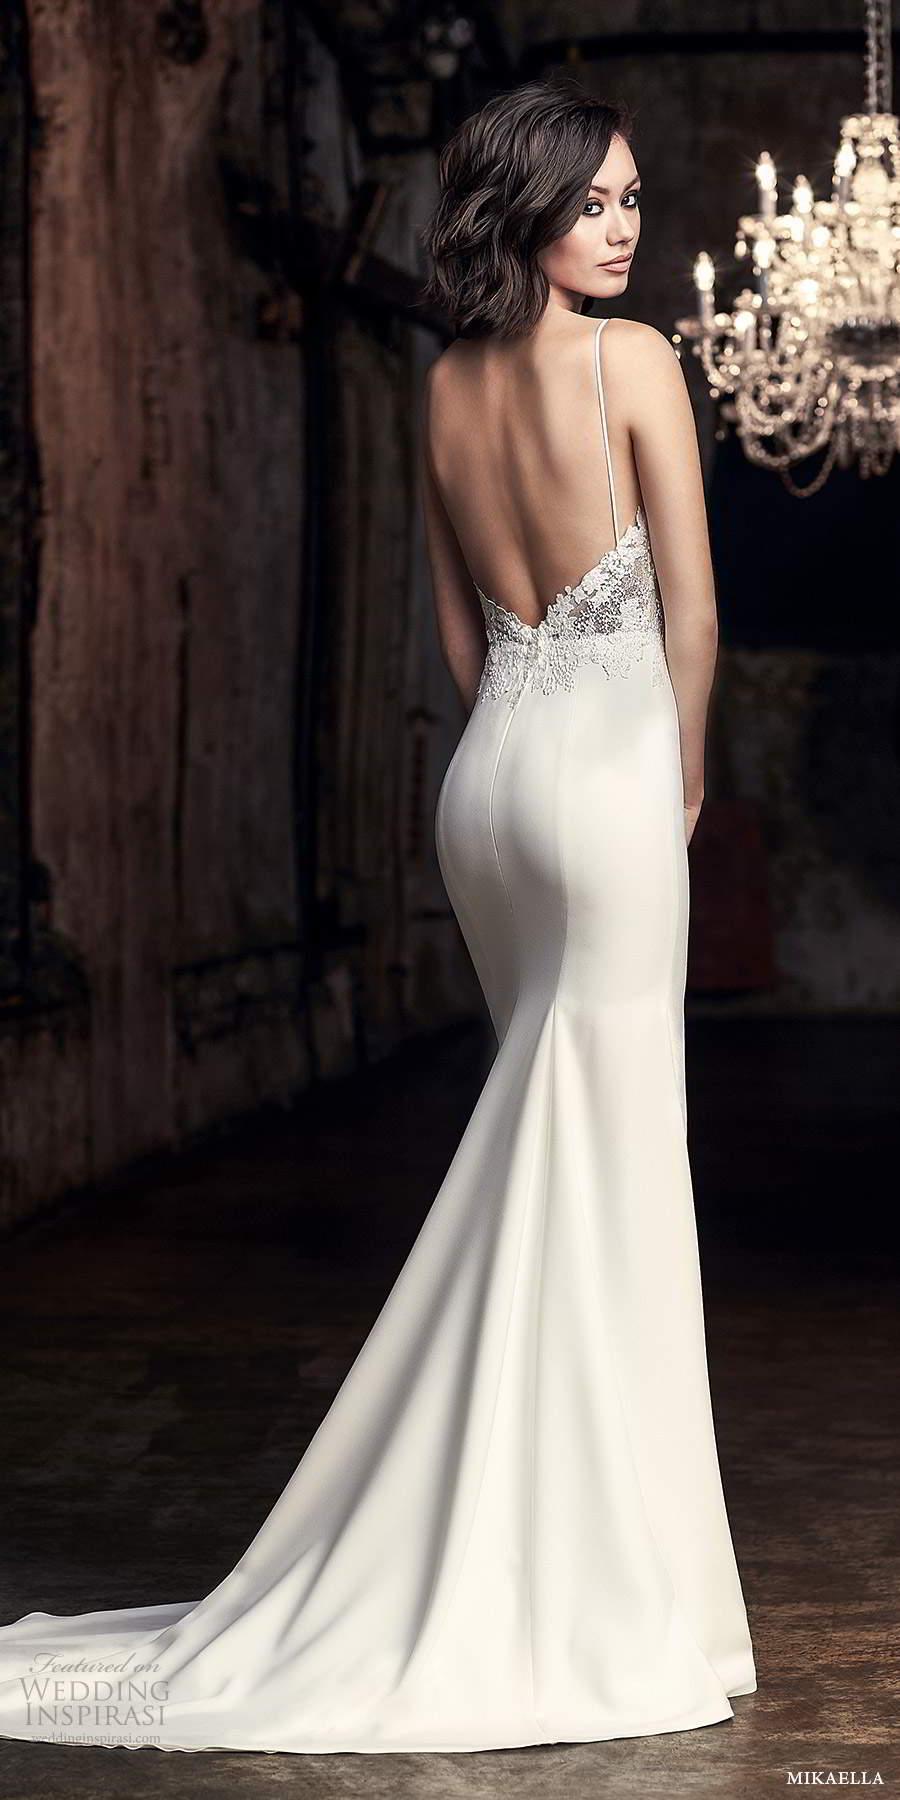 mikaella fall 2020 bridal sleeveless thing straps sweetheart neckline embellished lace bodice fit flare mermaid wedding dress slit skirt low back chapel train (5) bv